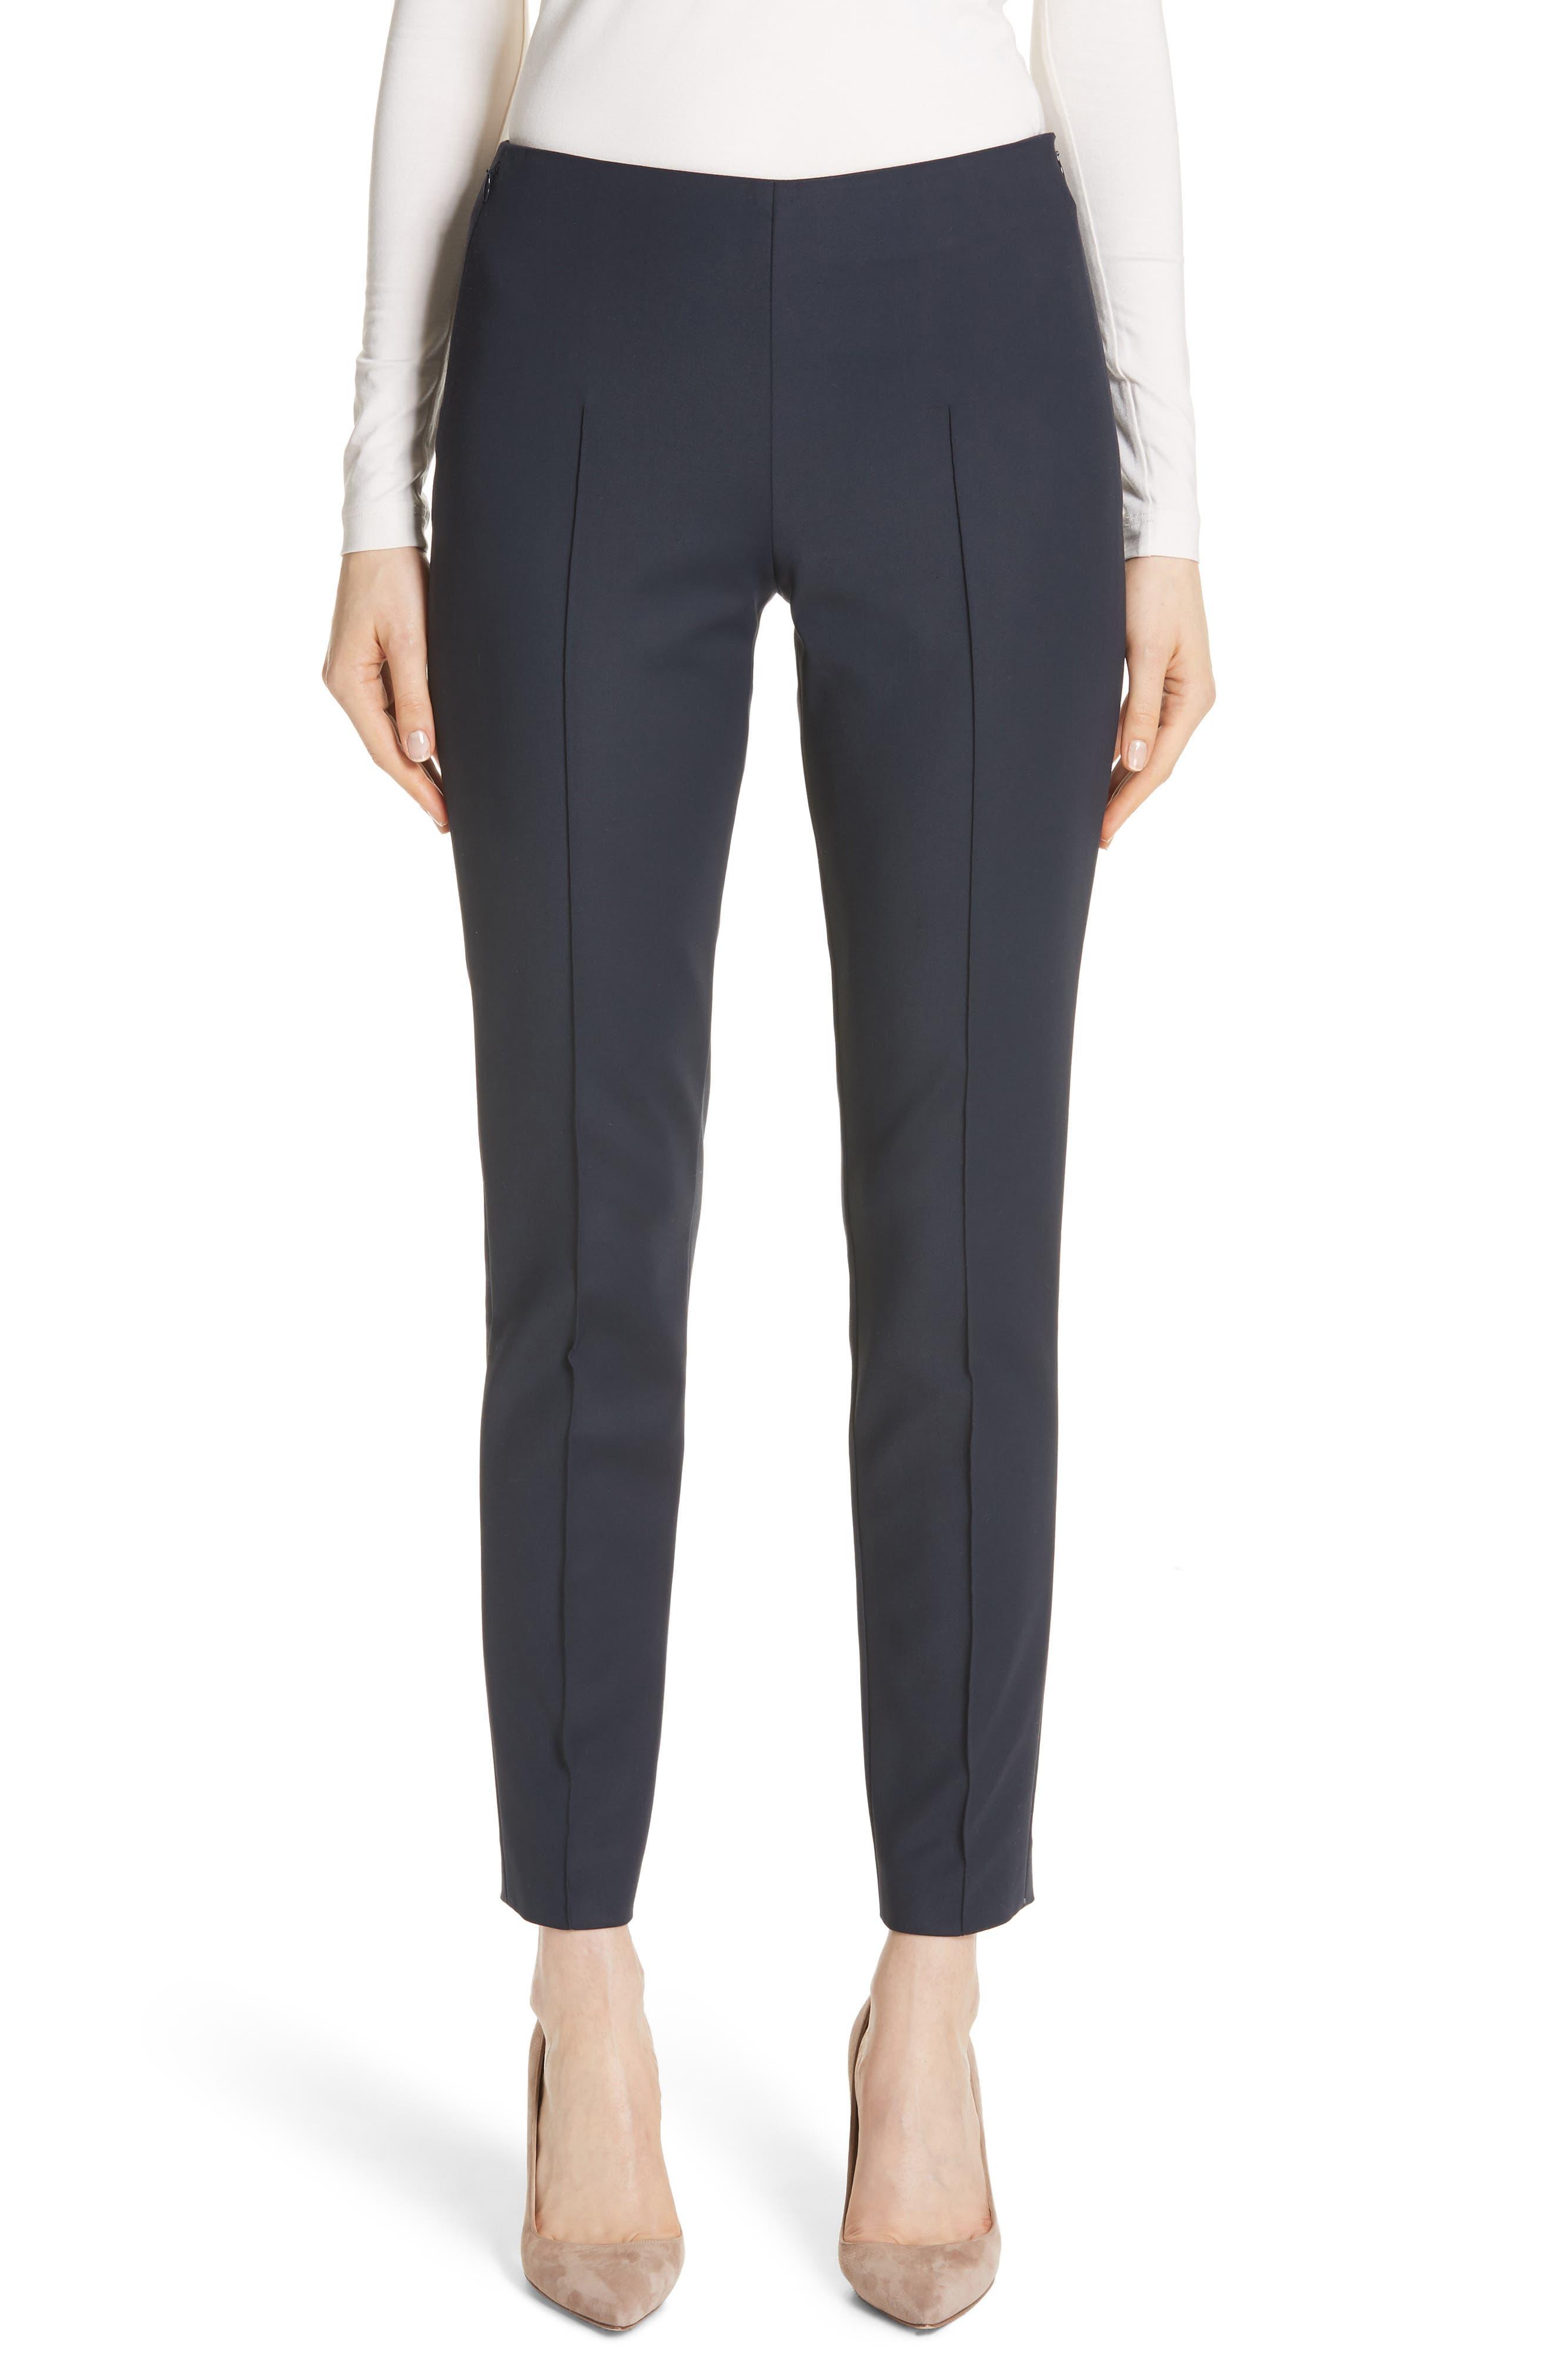 Alternate Image 1 Selected - Akris 'Melissa' Slim Techno Cotton Ankle Pants